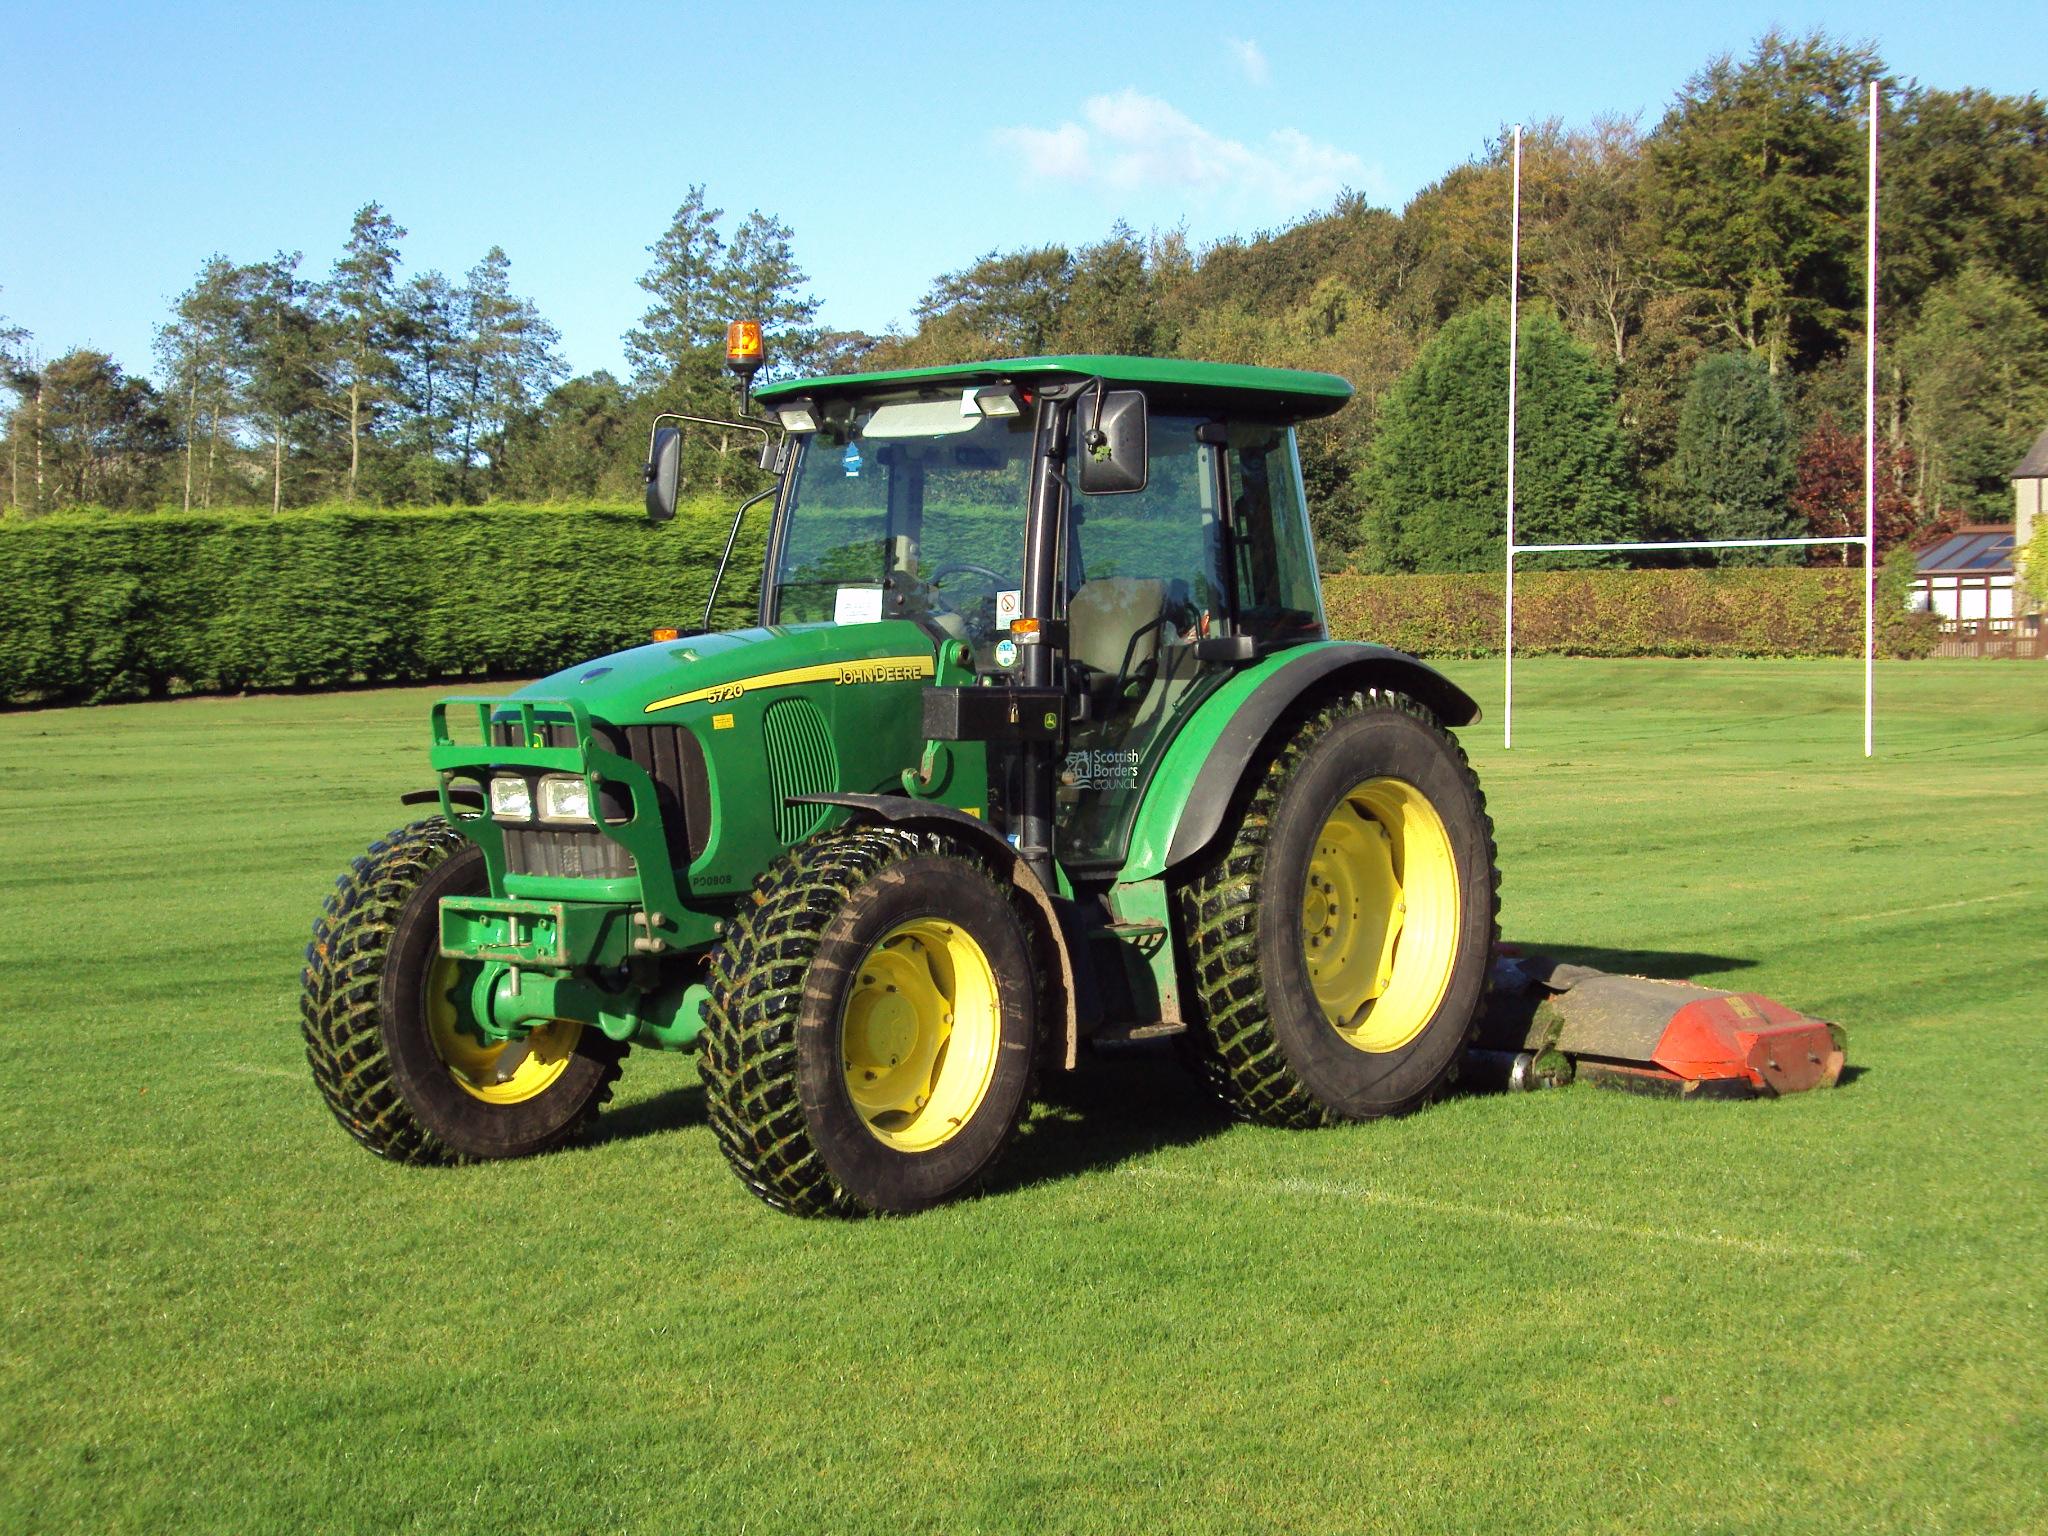 español youtube john deere tractors pact john deere tractors utility #137EB8